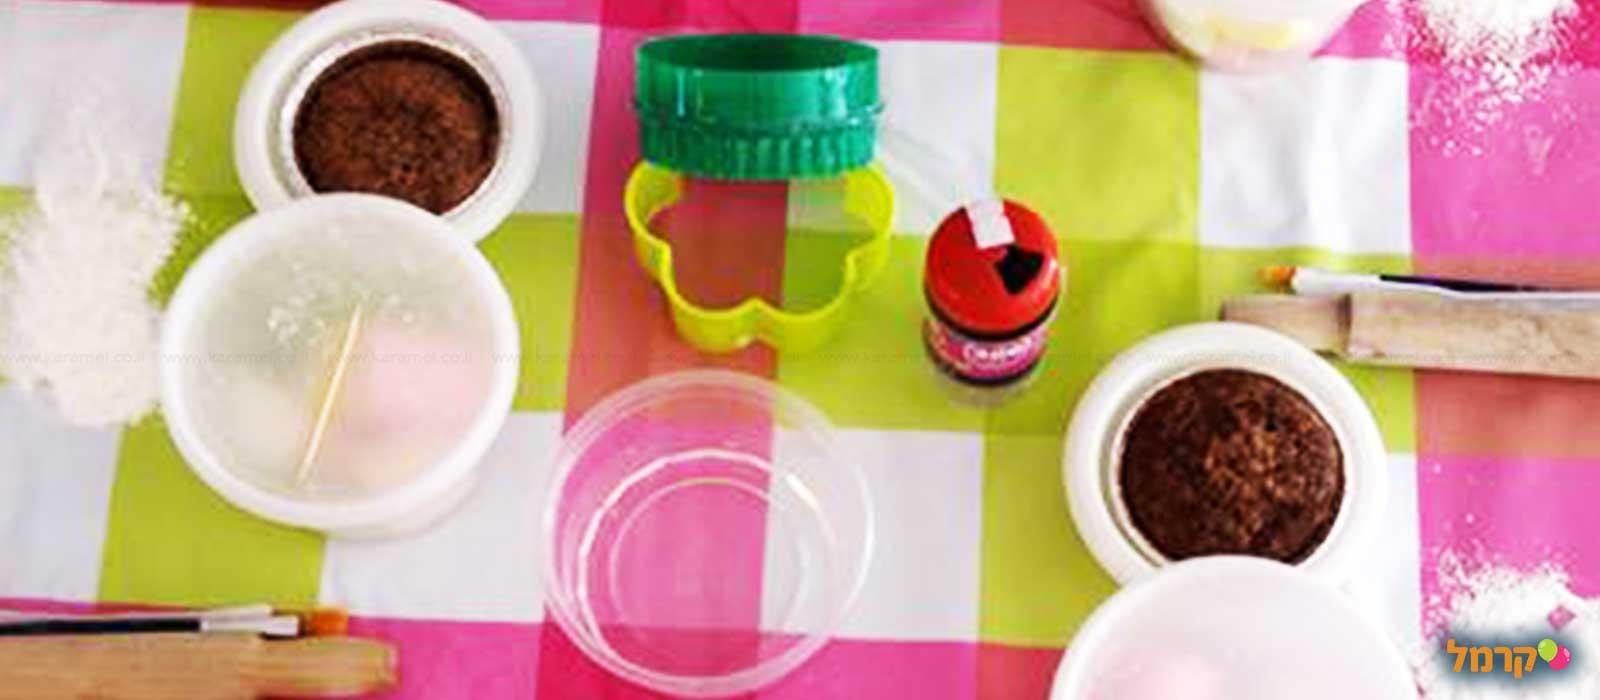 Aya's Sweets - סדנה מתוקה - 073-7597053